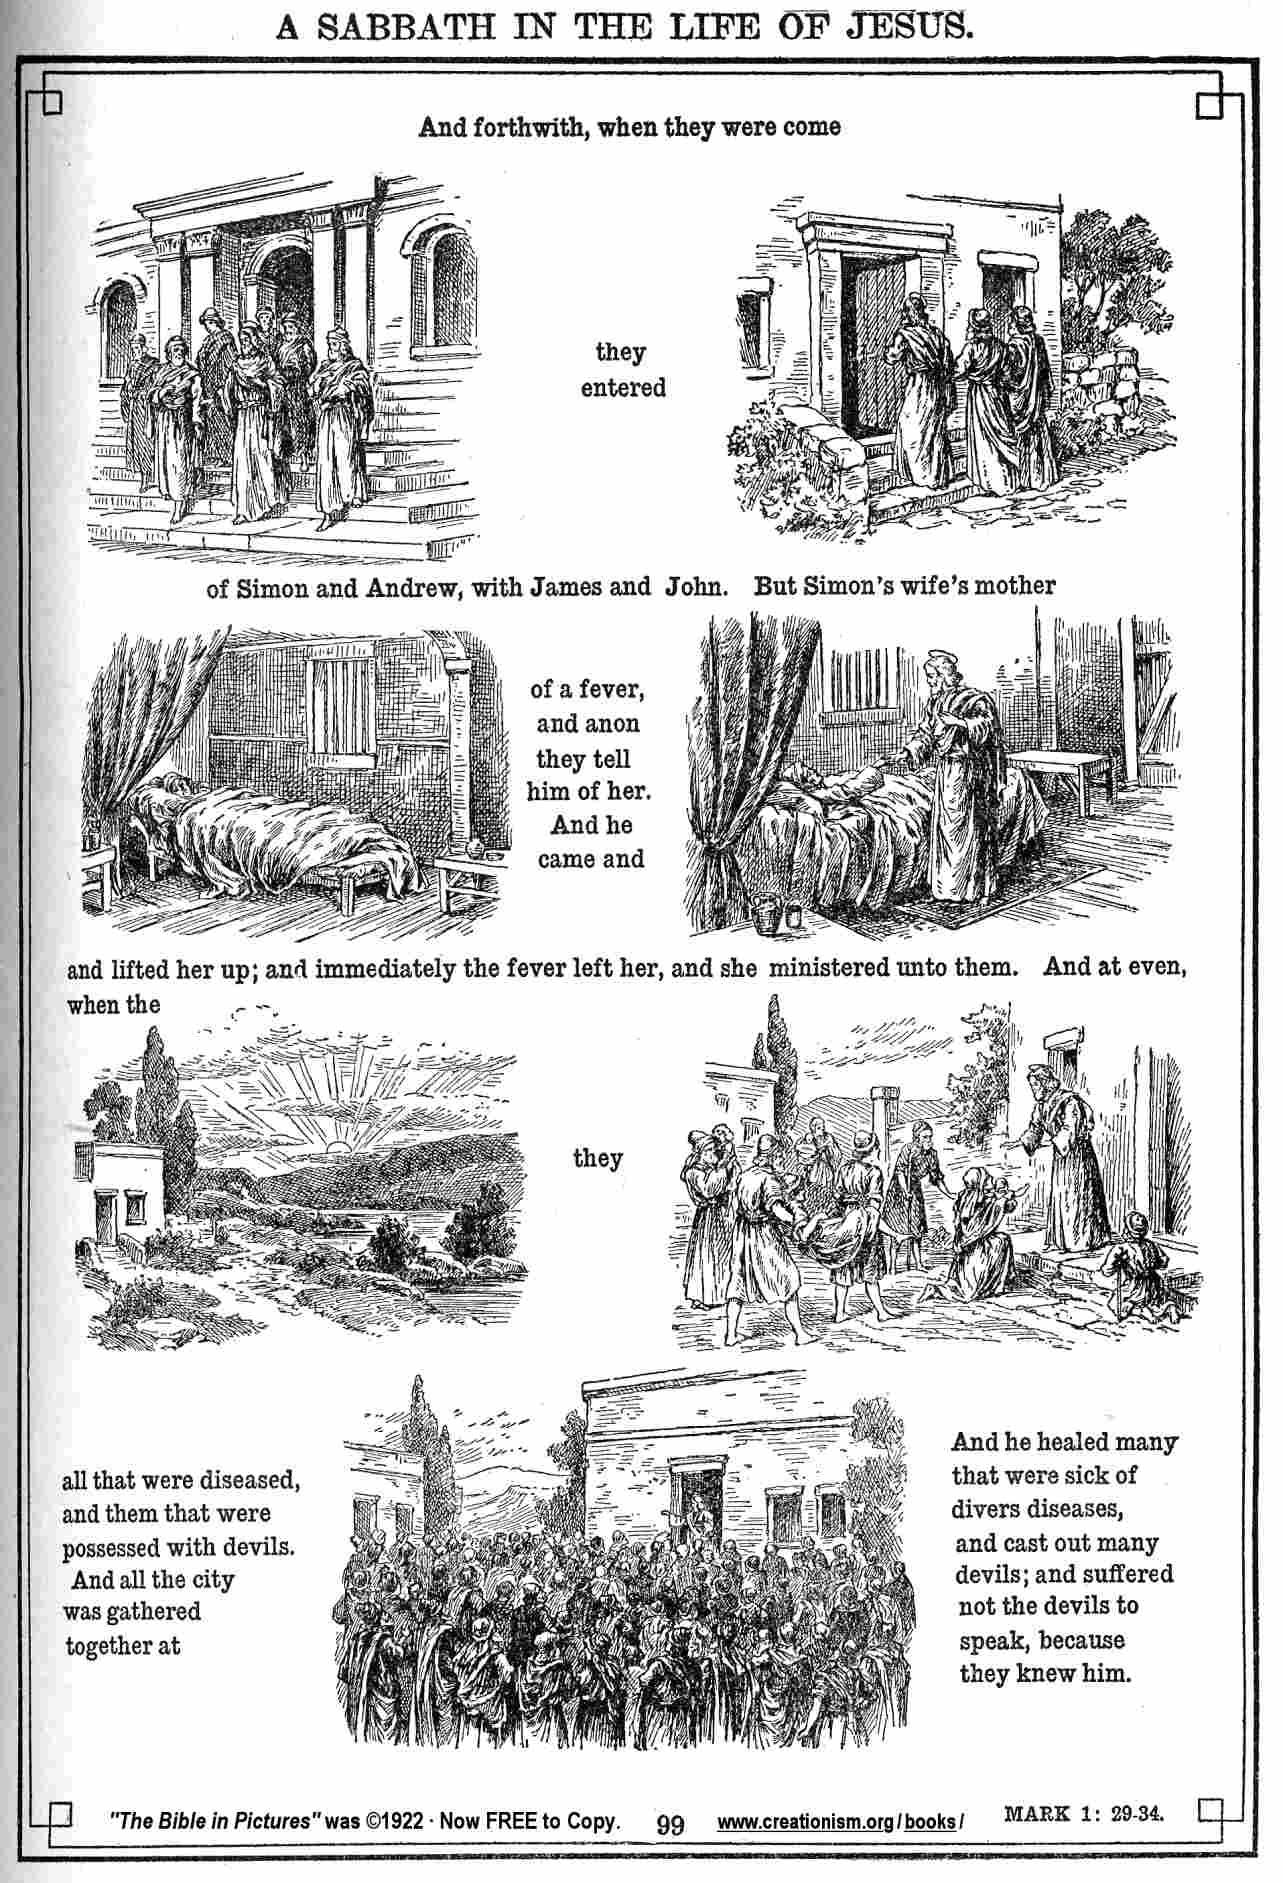 Sabbath in the life of jesus jpg